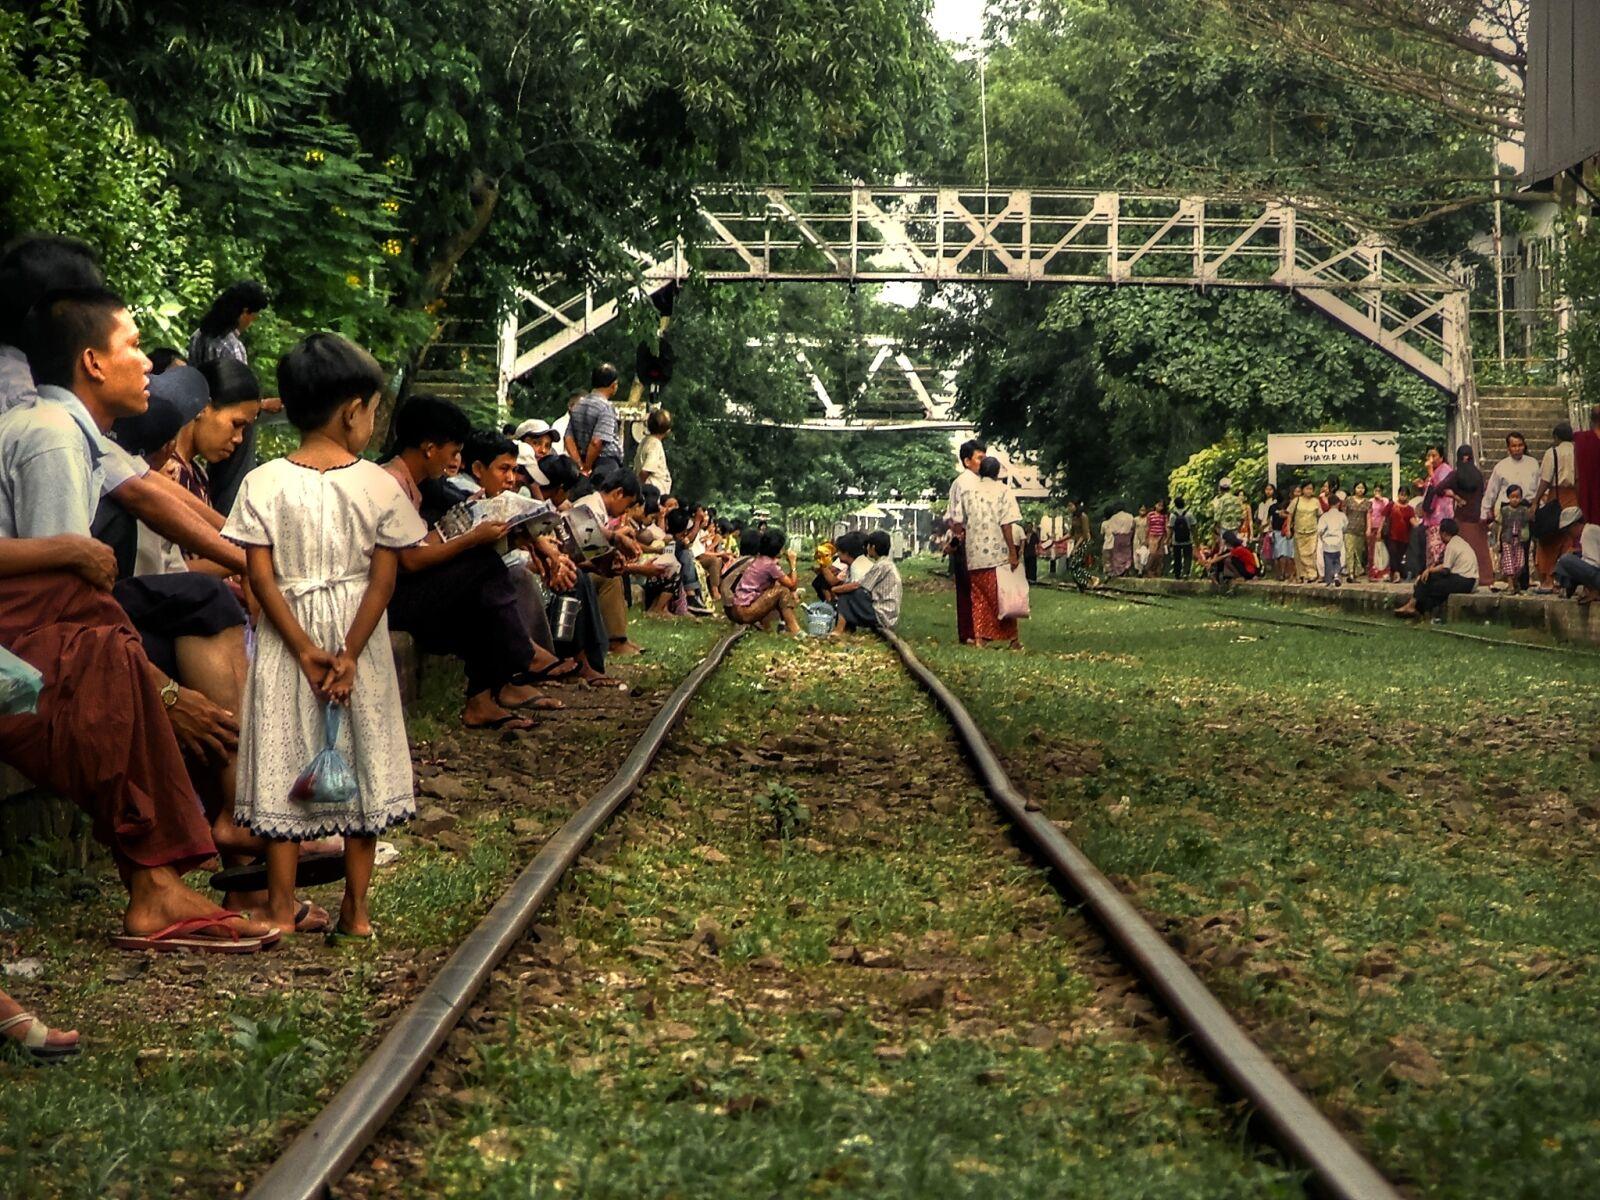 station, wait, people